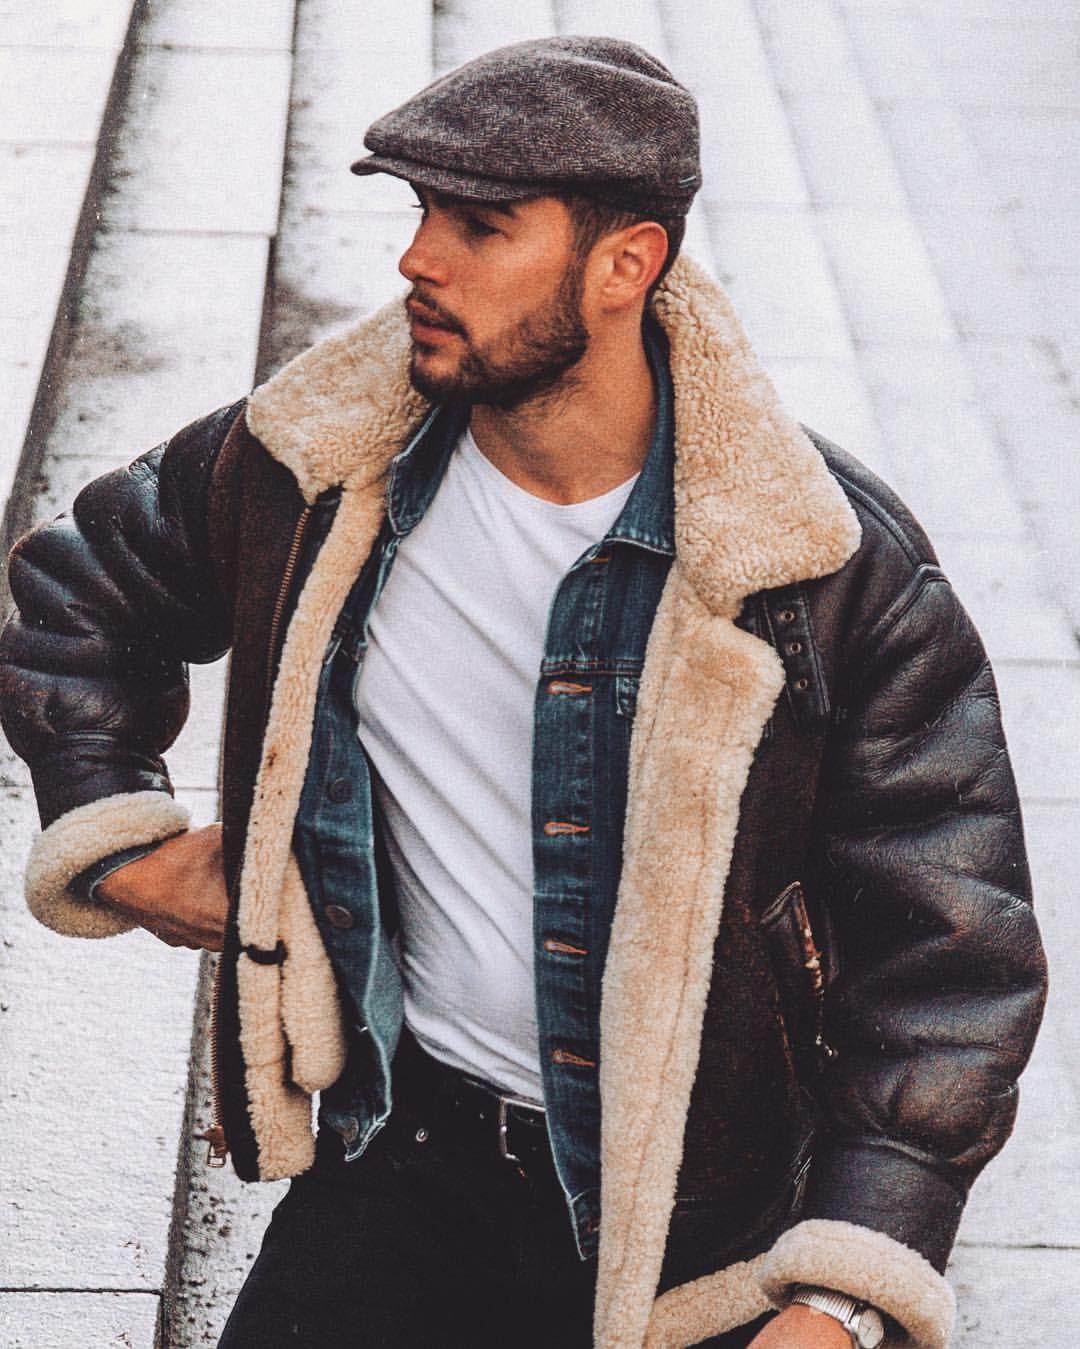 Sheepskin flying jacket Mens Fashion MichaelLouis www